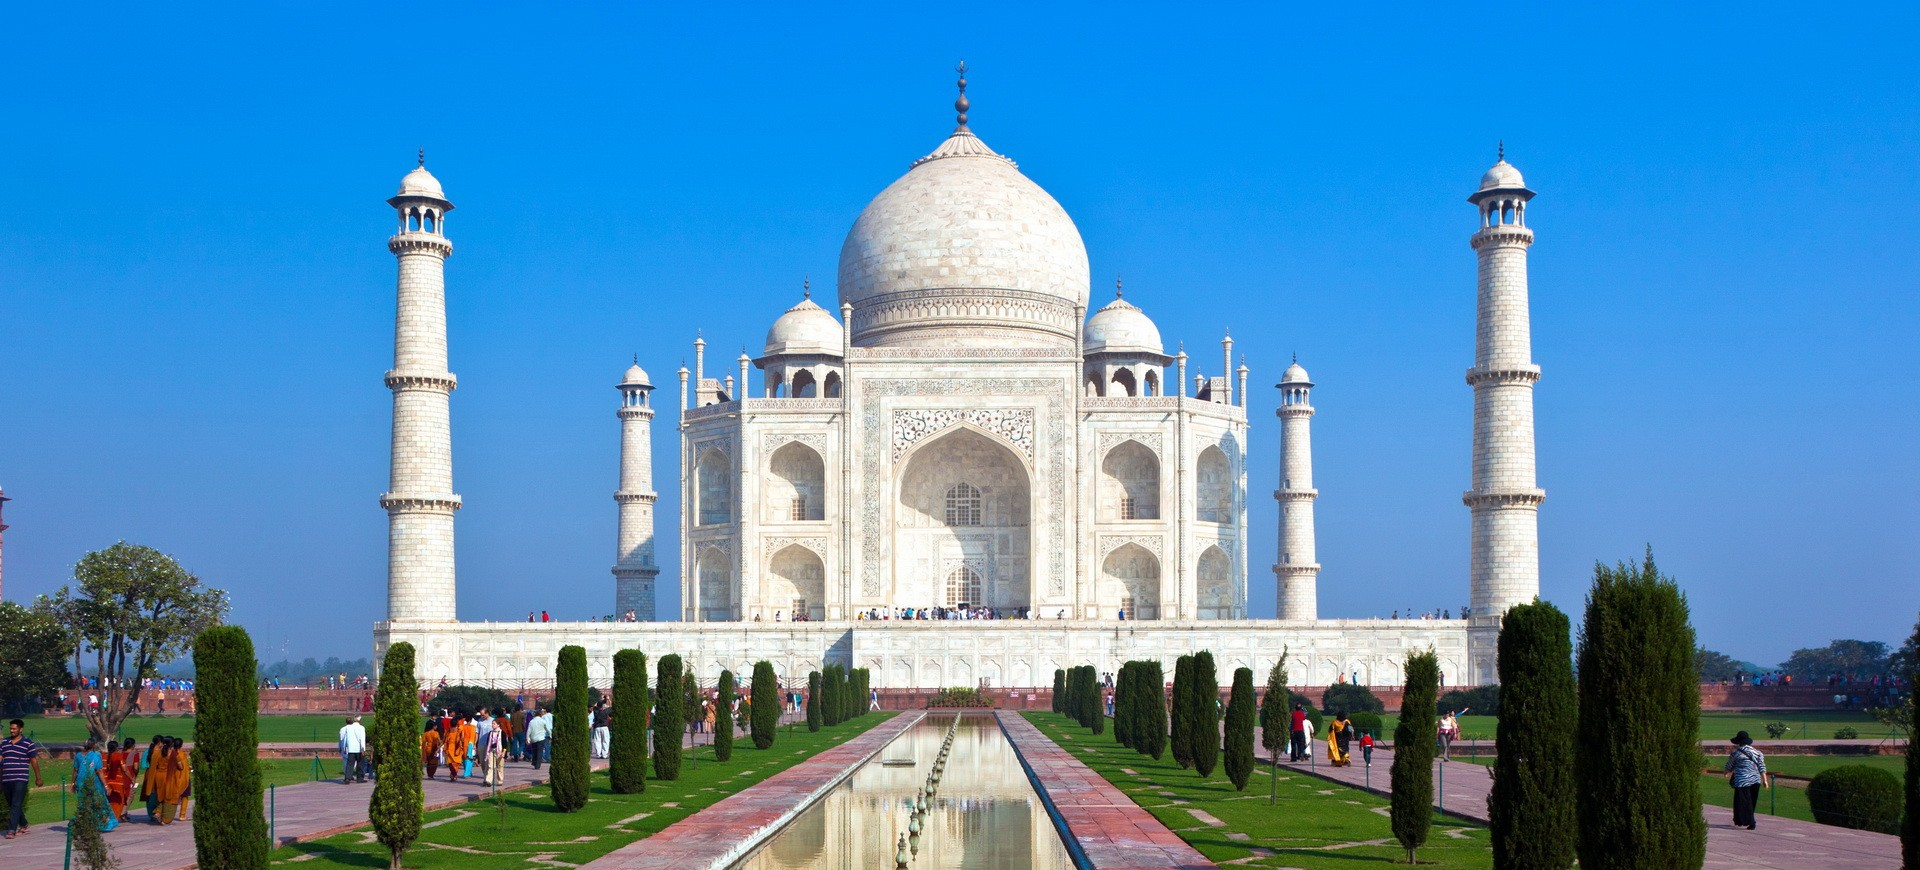 Inde Agra Taj Mahal monument Moghol